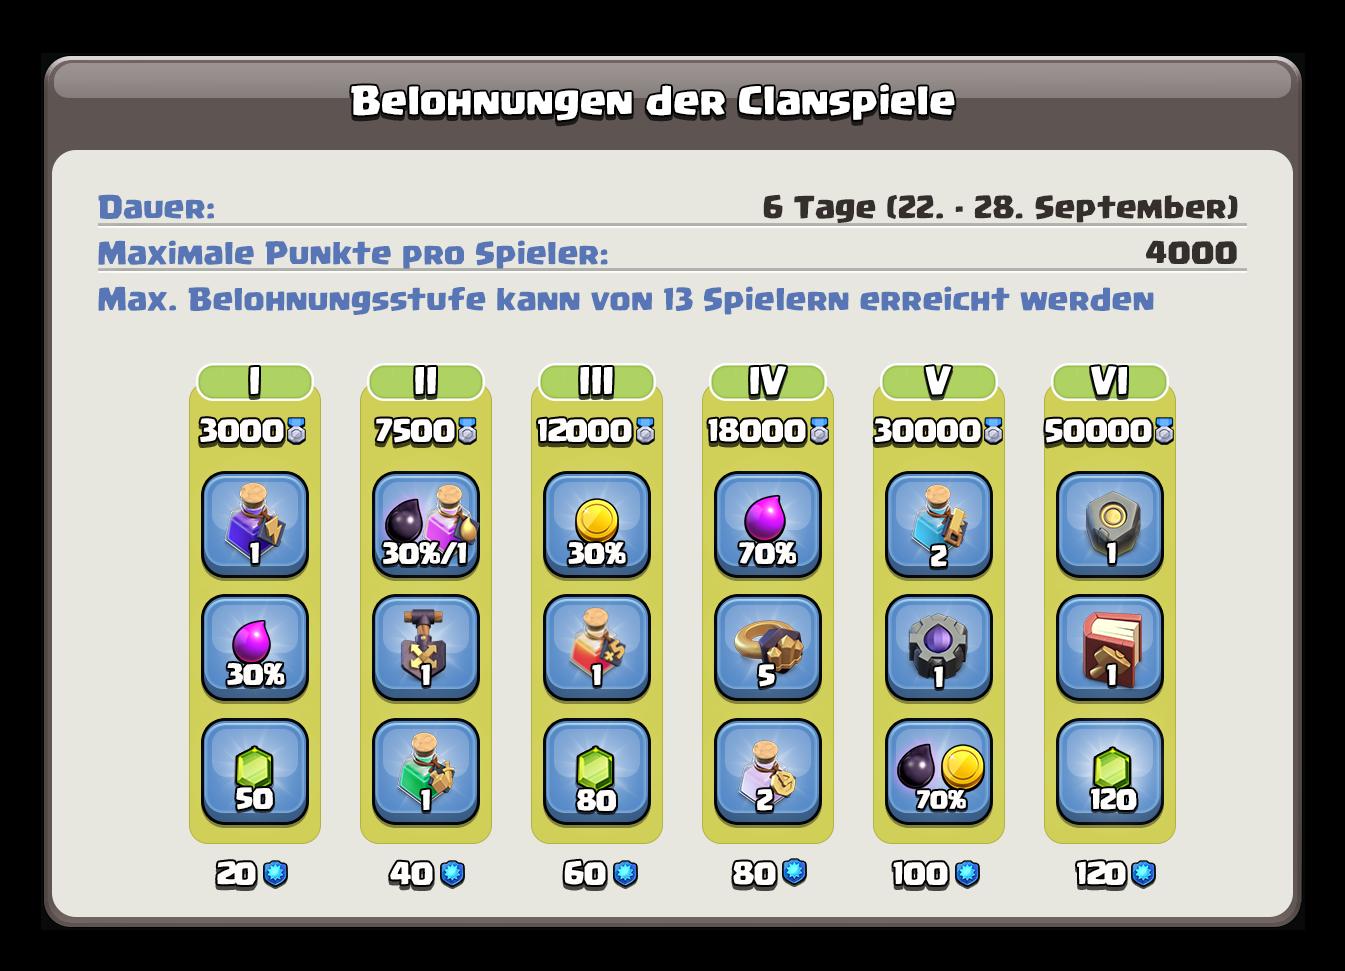 Clanspiele220919